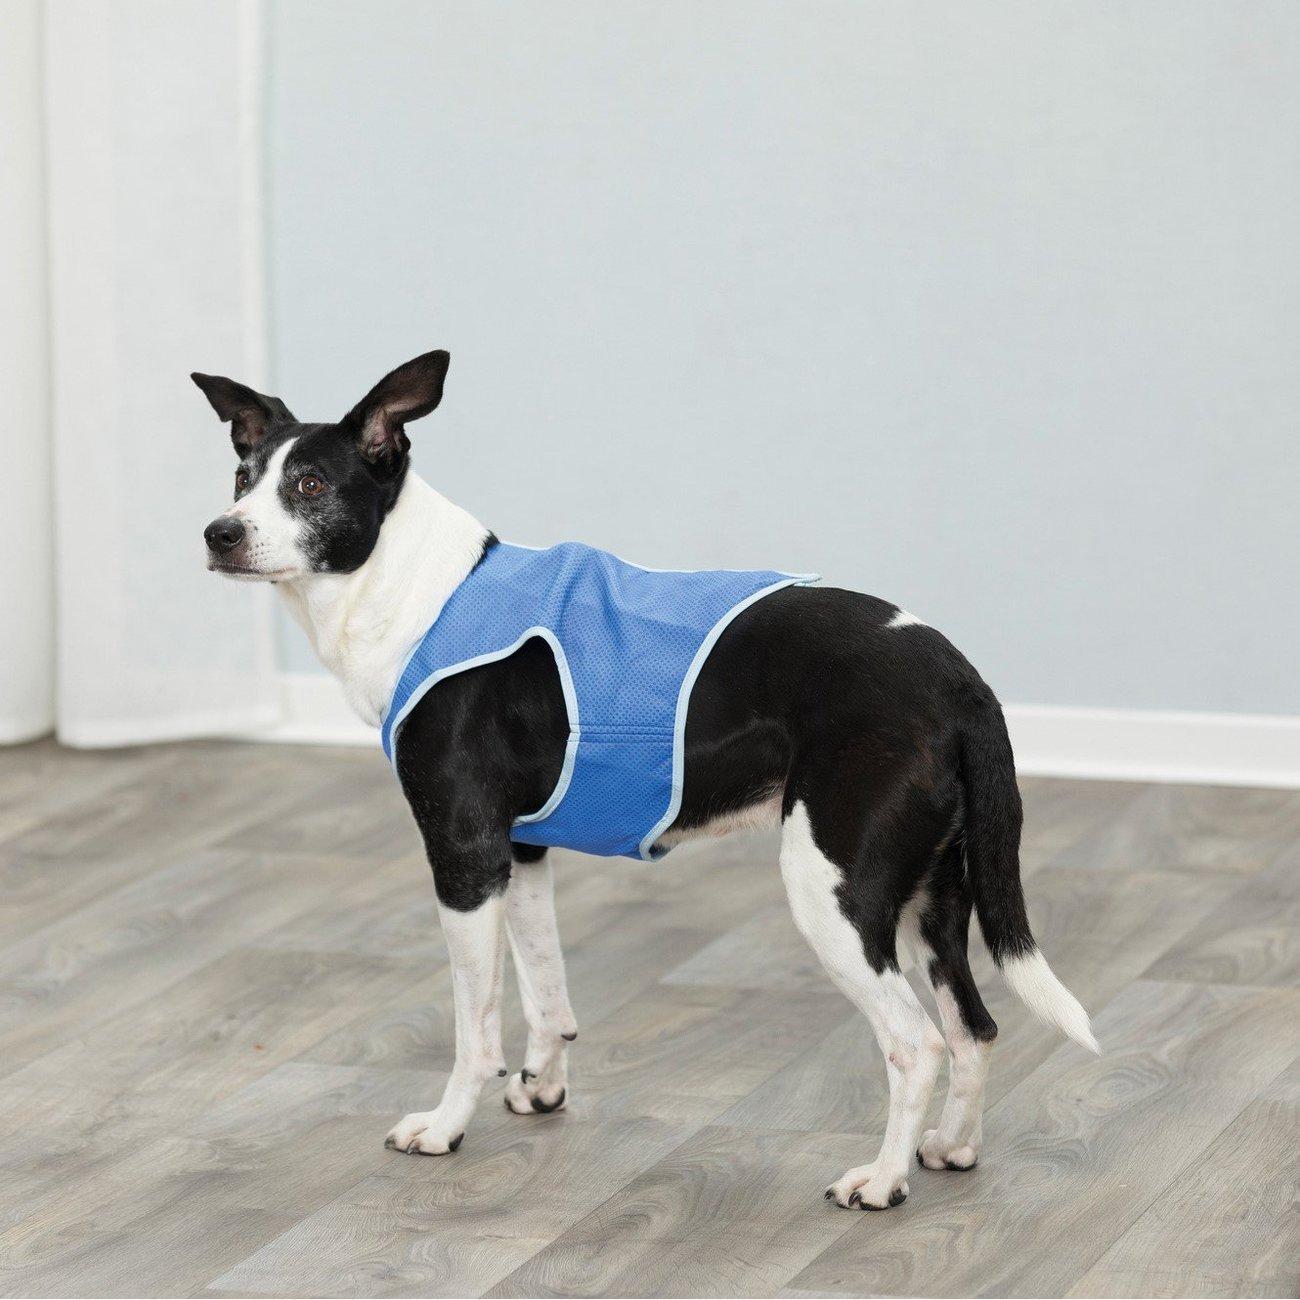 TRIXIE Kühlweste für Hunde 30131, Bild 2